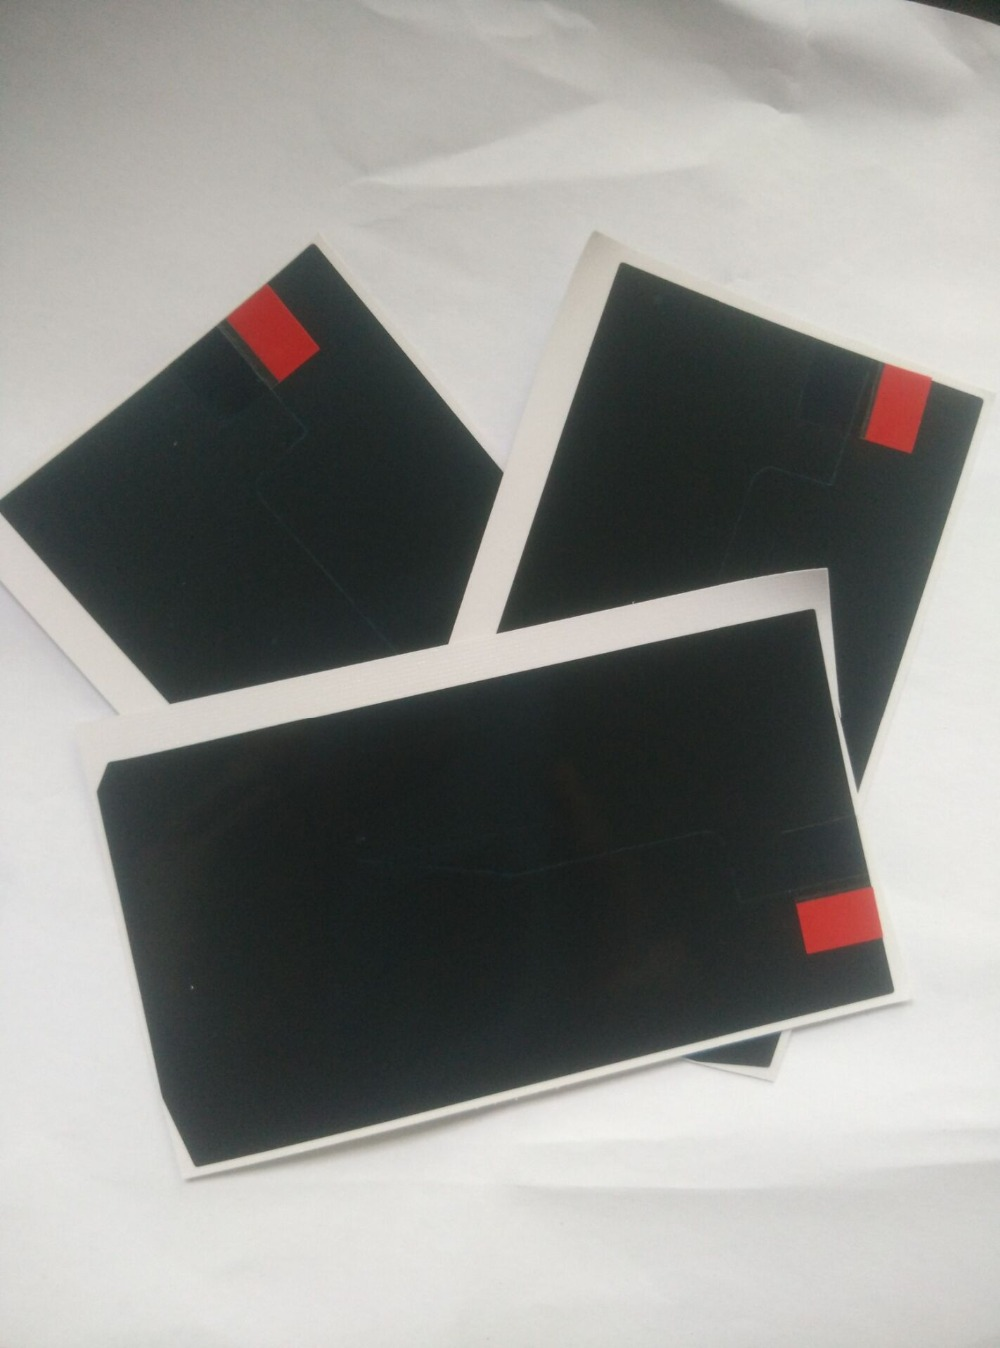 10PCS/LOT Original Replacement Back Adhesive Glue Sticker Strip For Samsung Galaxy S5 Mini SM-G800 Repair LCD Screen Backlight